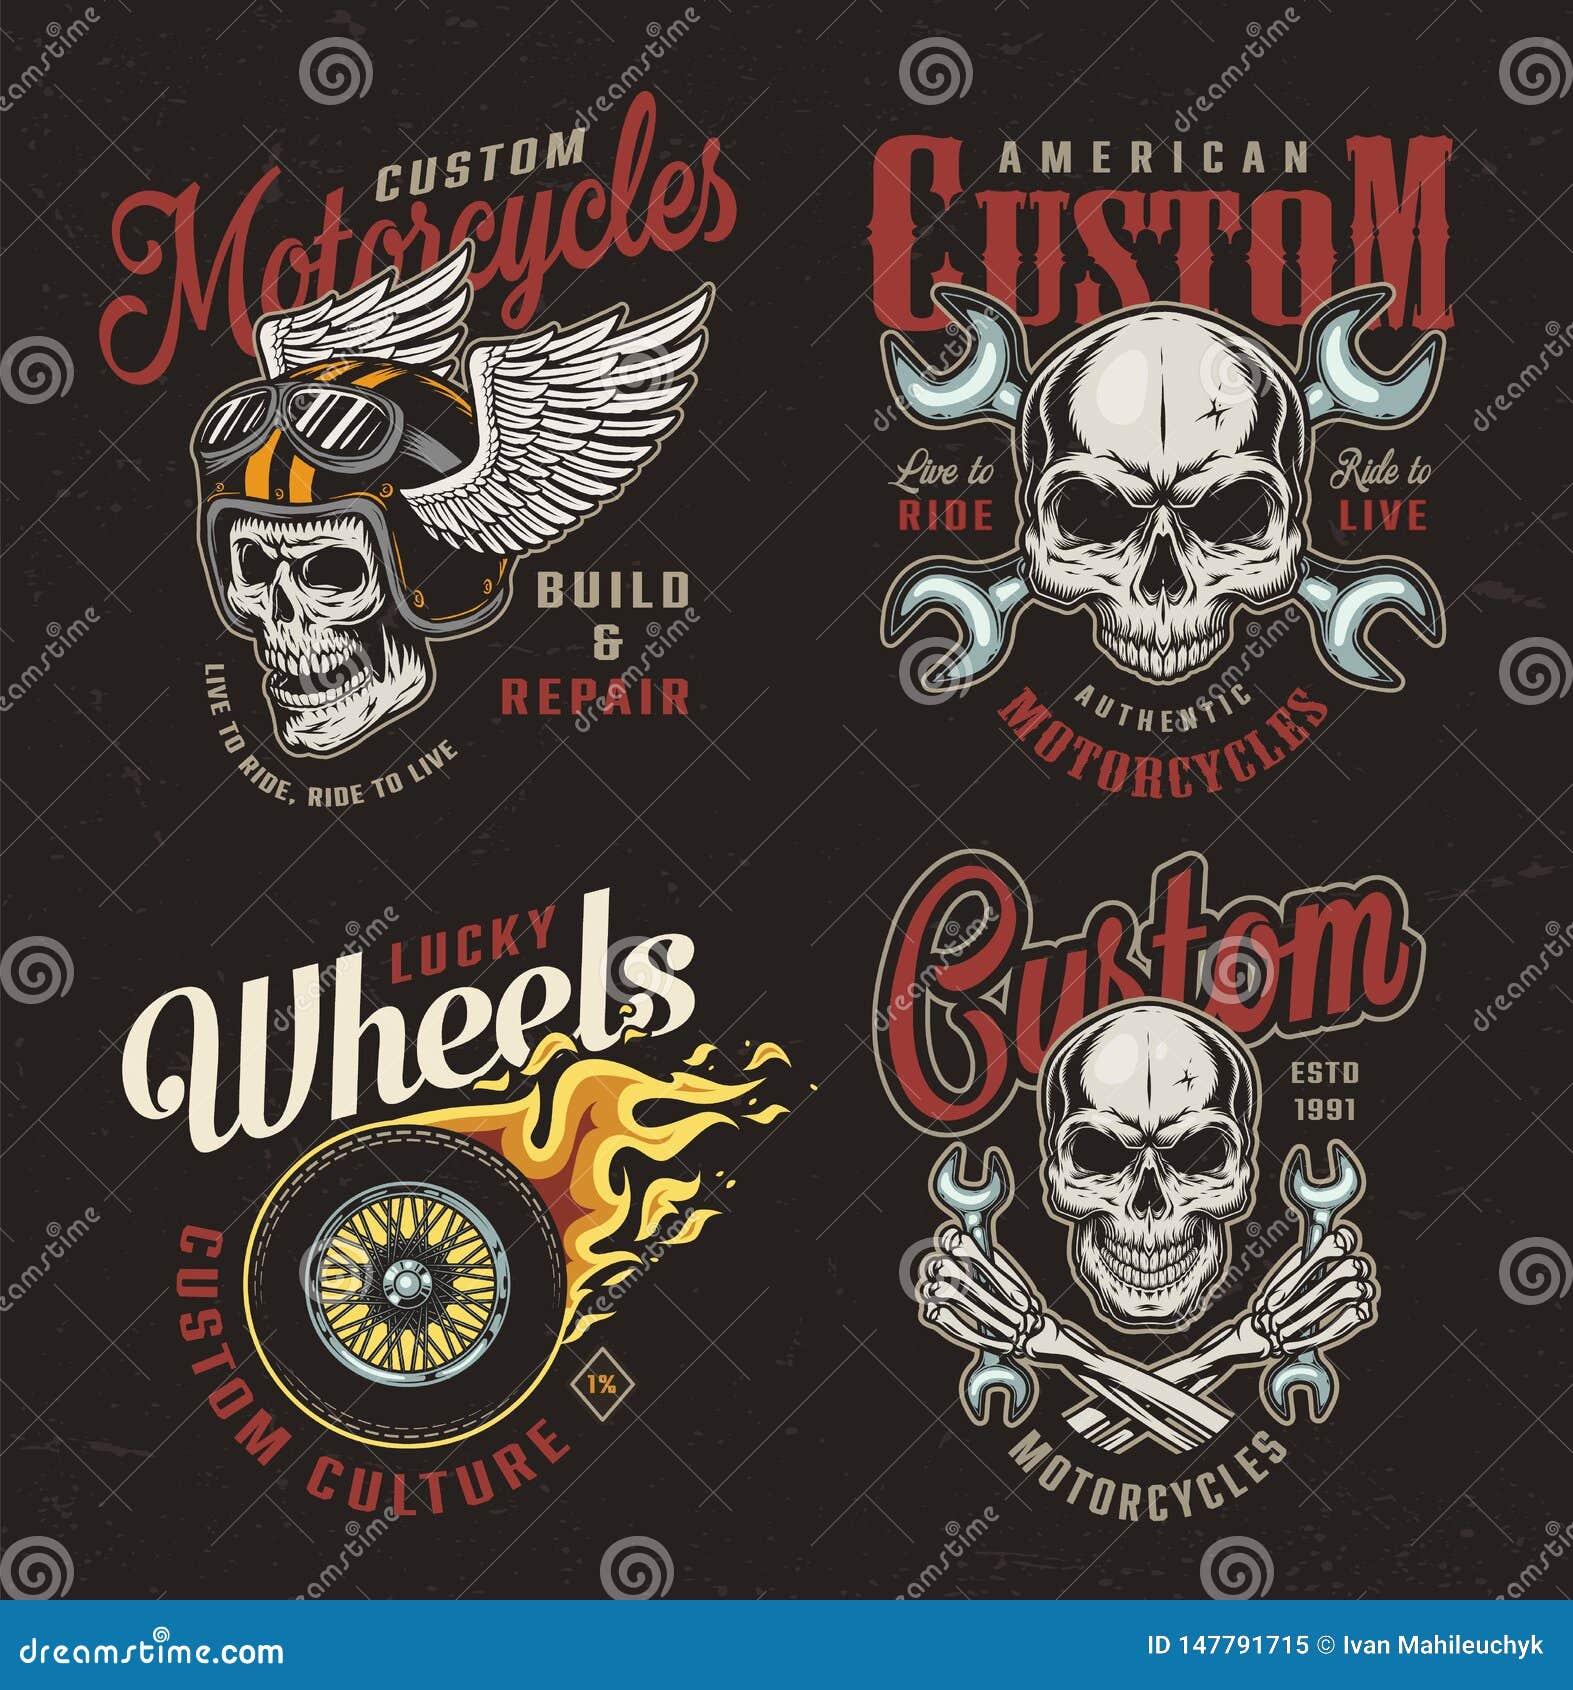 Vintage motorcycle colorful emblems